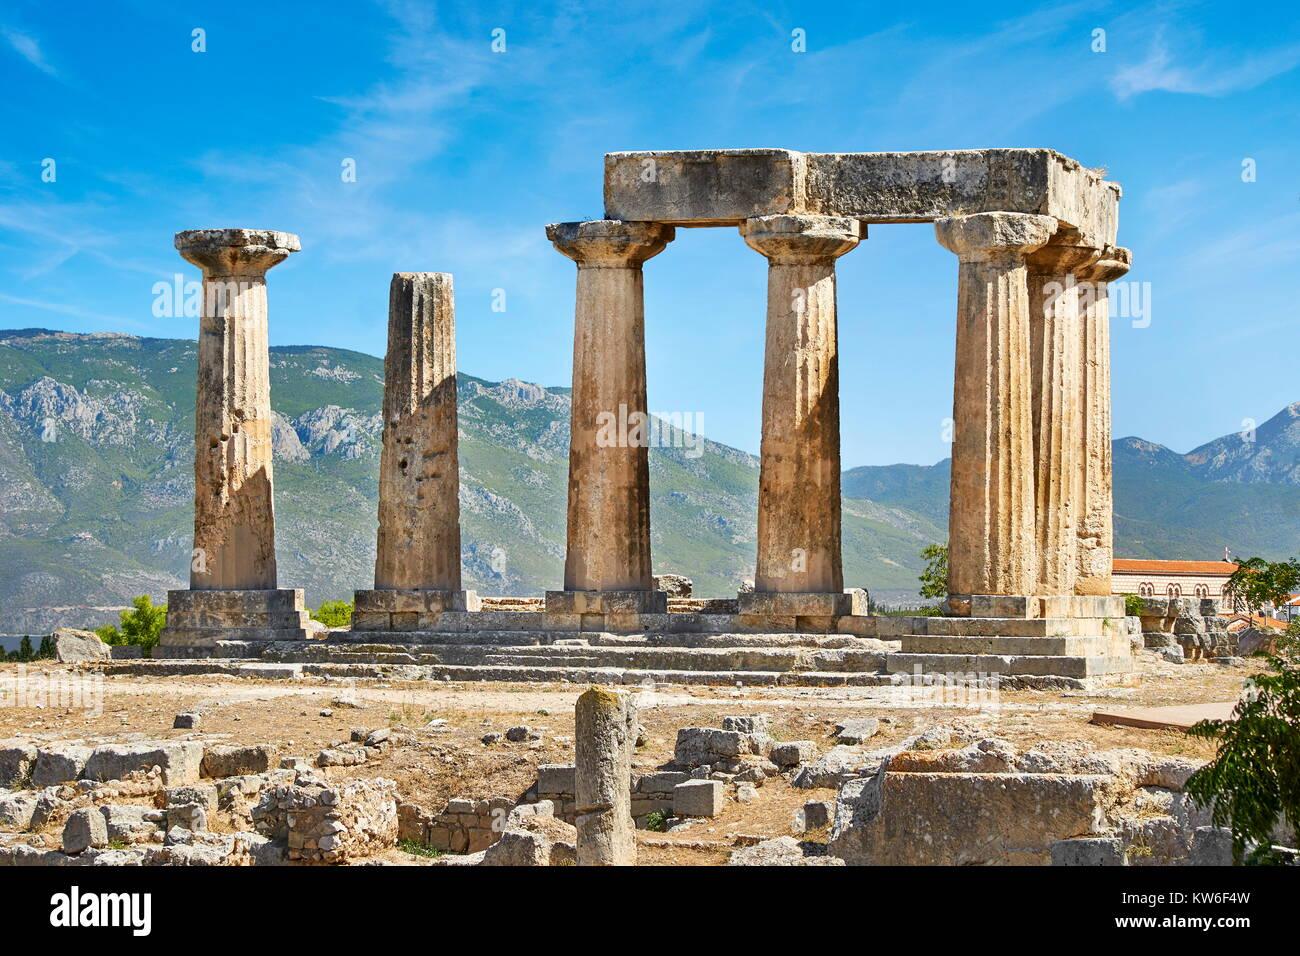 The Temple of Apollo, ancient Corinth, Greece Stock Photo